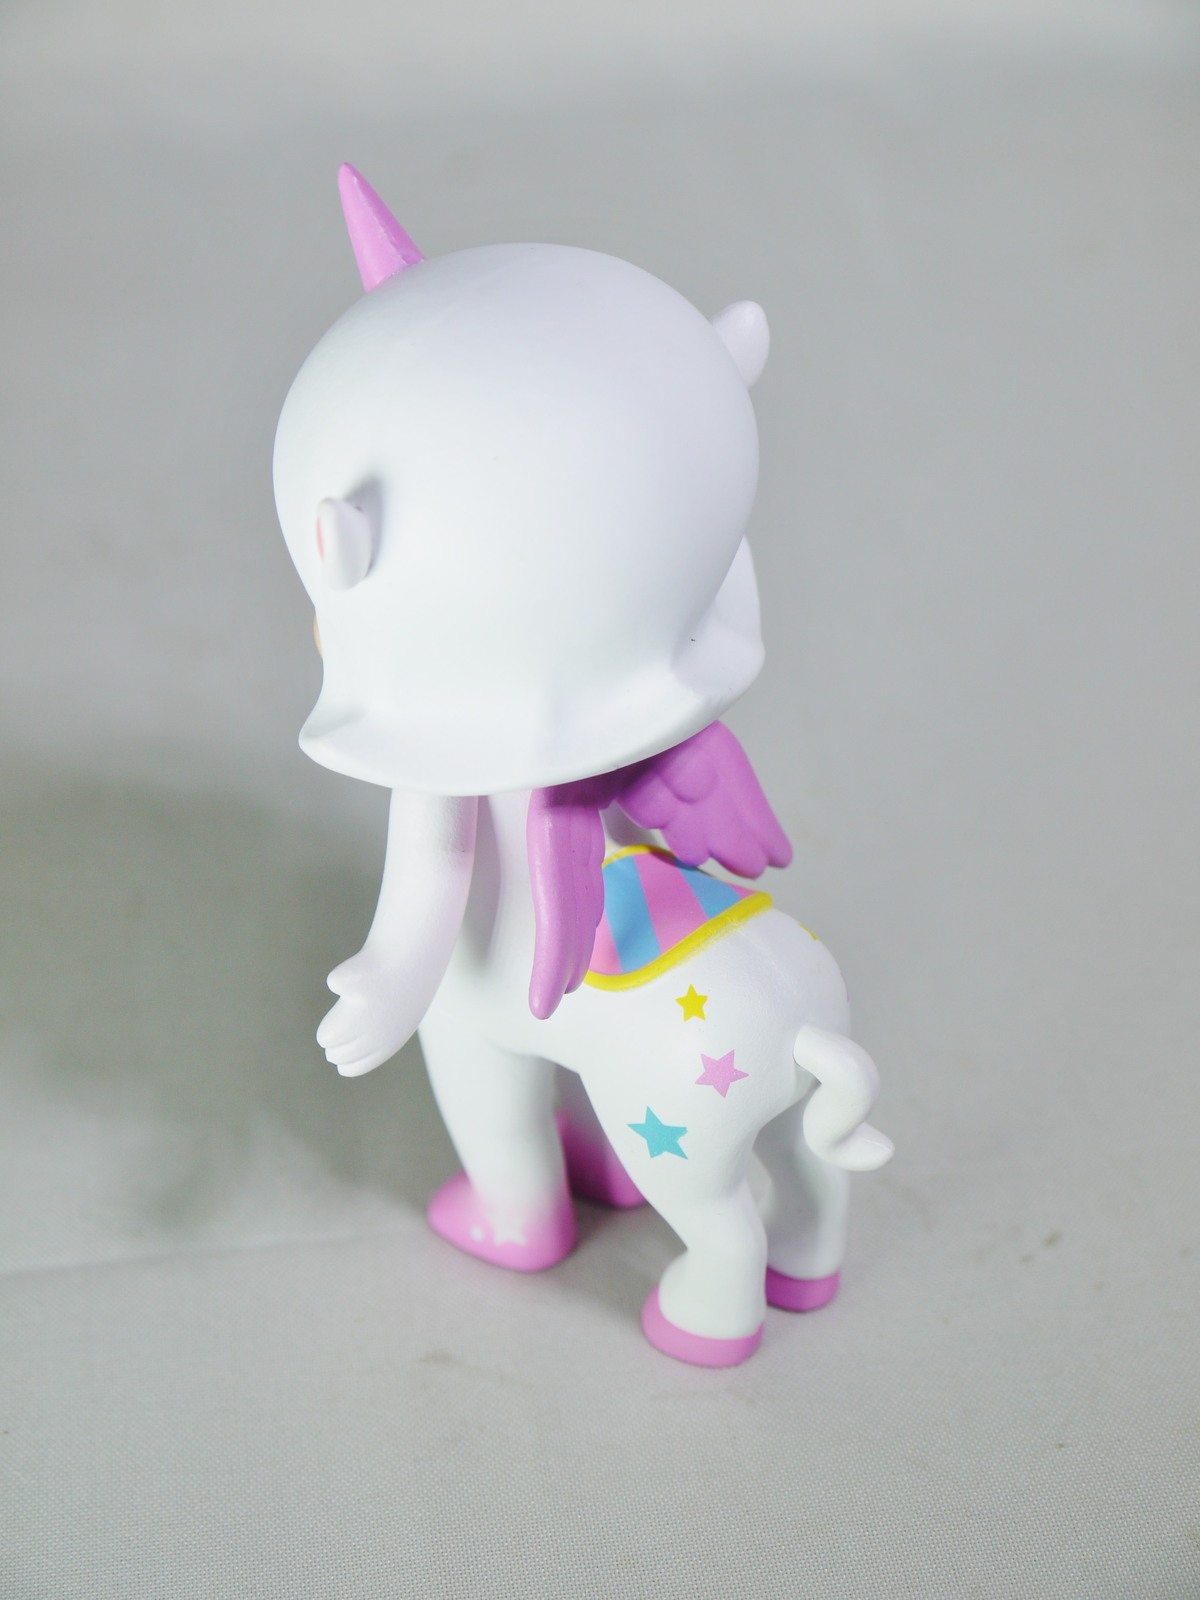 POP MART Kennyswork BLOCK Little Molly Chinese Zodiac Unicorn Horse Mini Figure